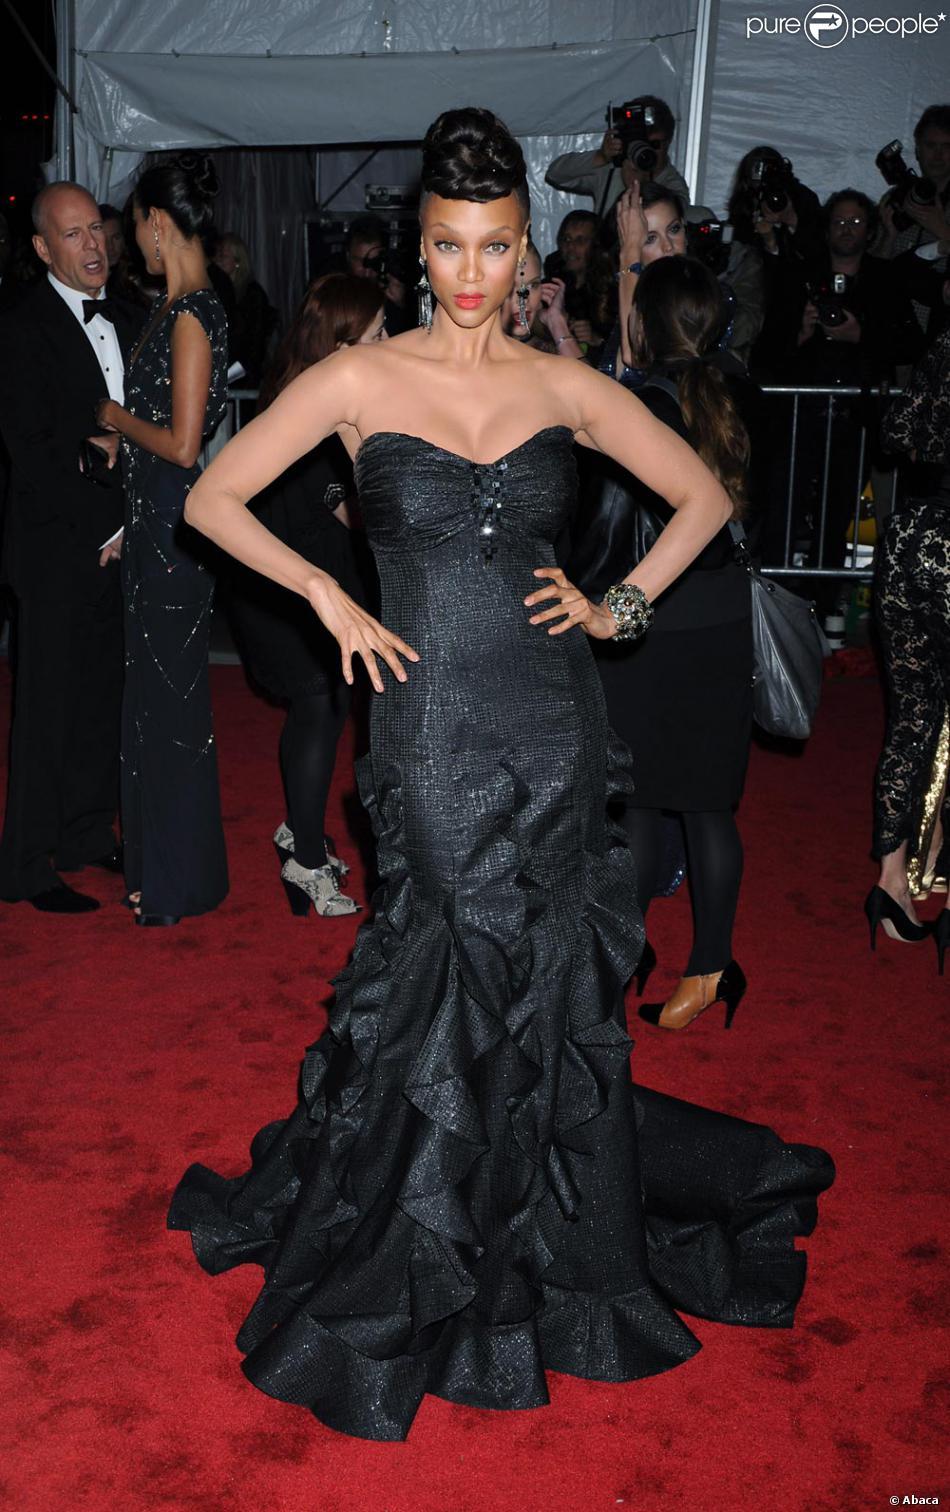 tyra banks lors du costume institute gala hier soir new york a choisi une tenue du cr ateur. Black Bedroom Furniture Sets. Home Design Ideas